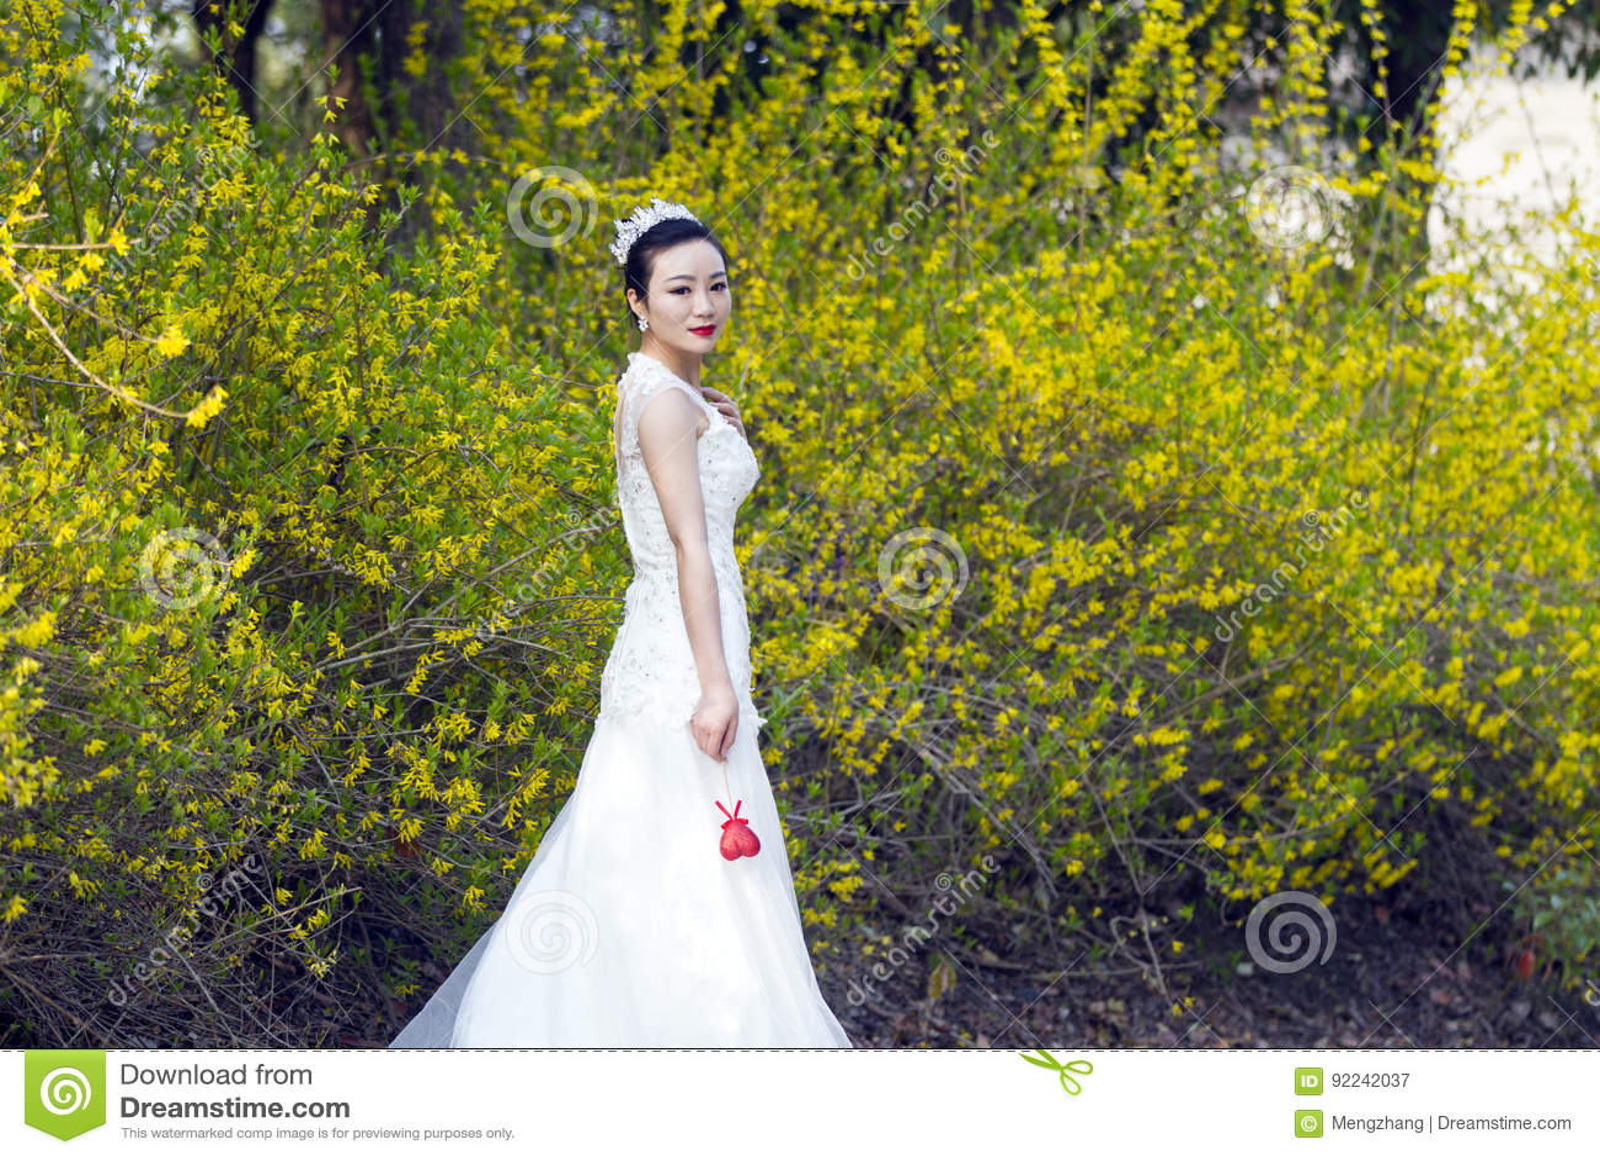 A Bride With White Wedding Dress Stand By Golden Jasmine